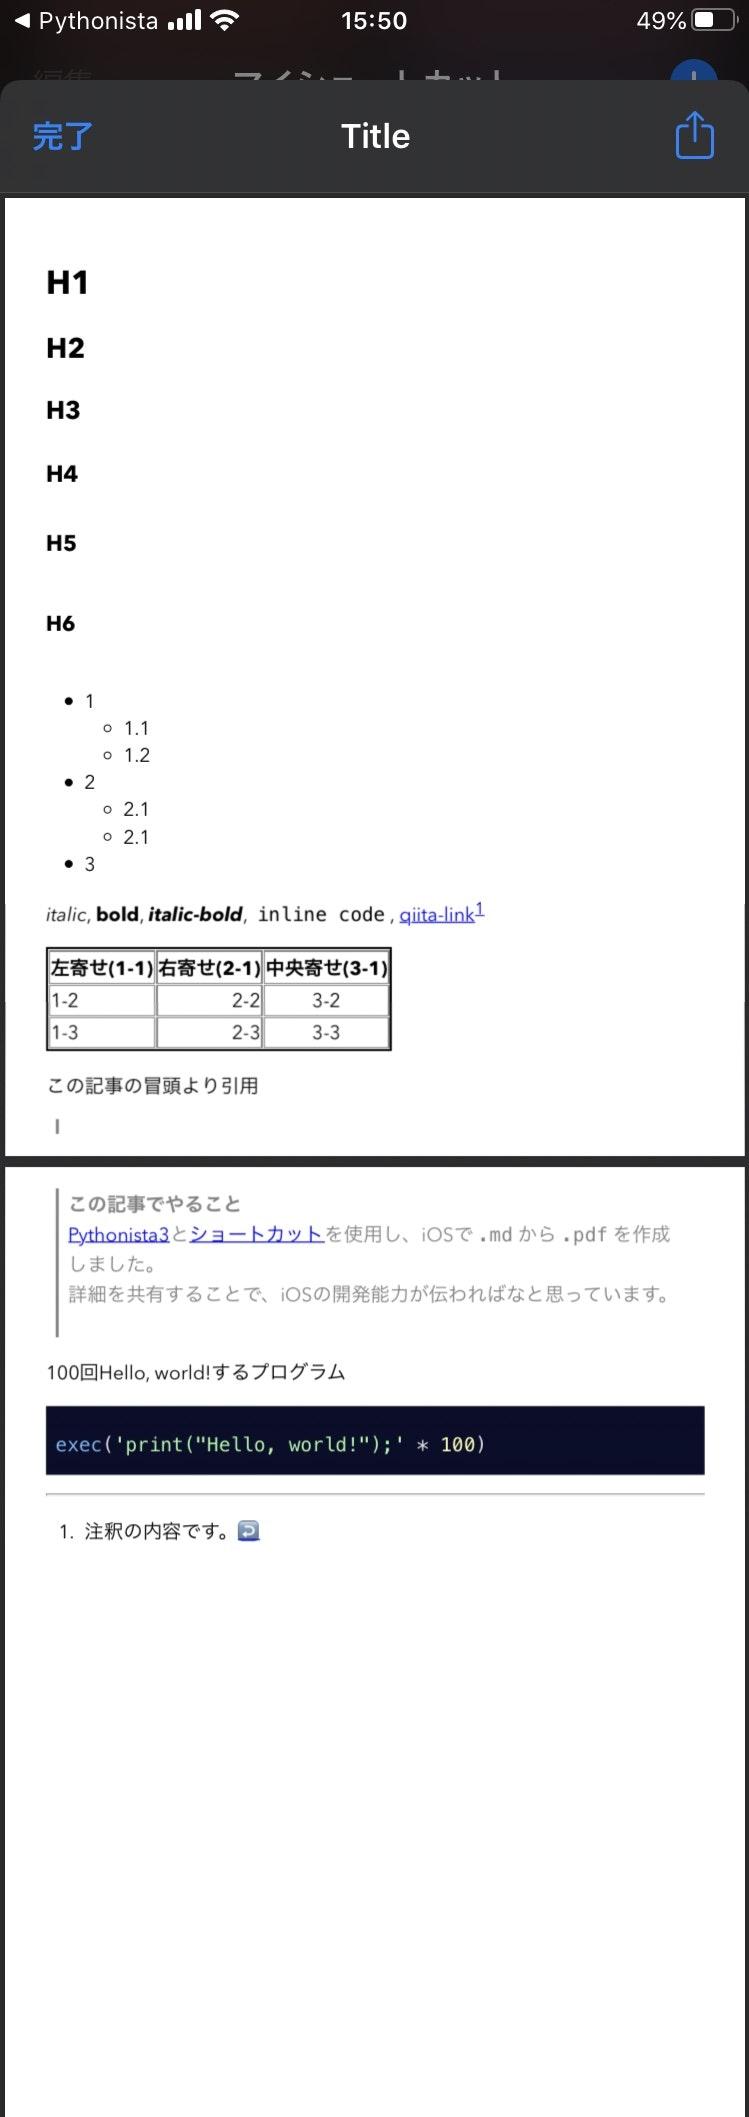 result.jpeg